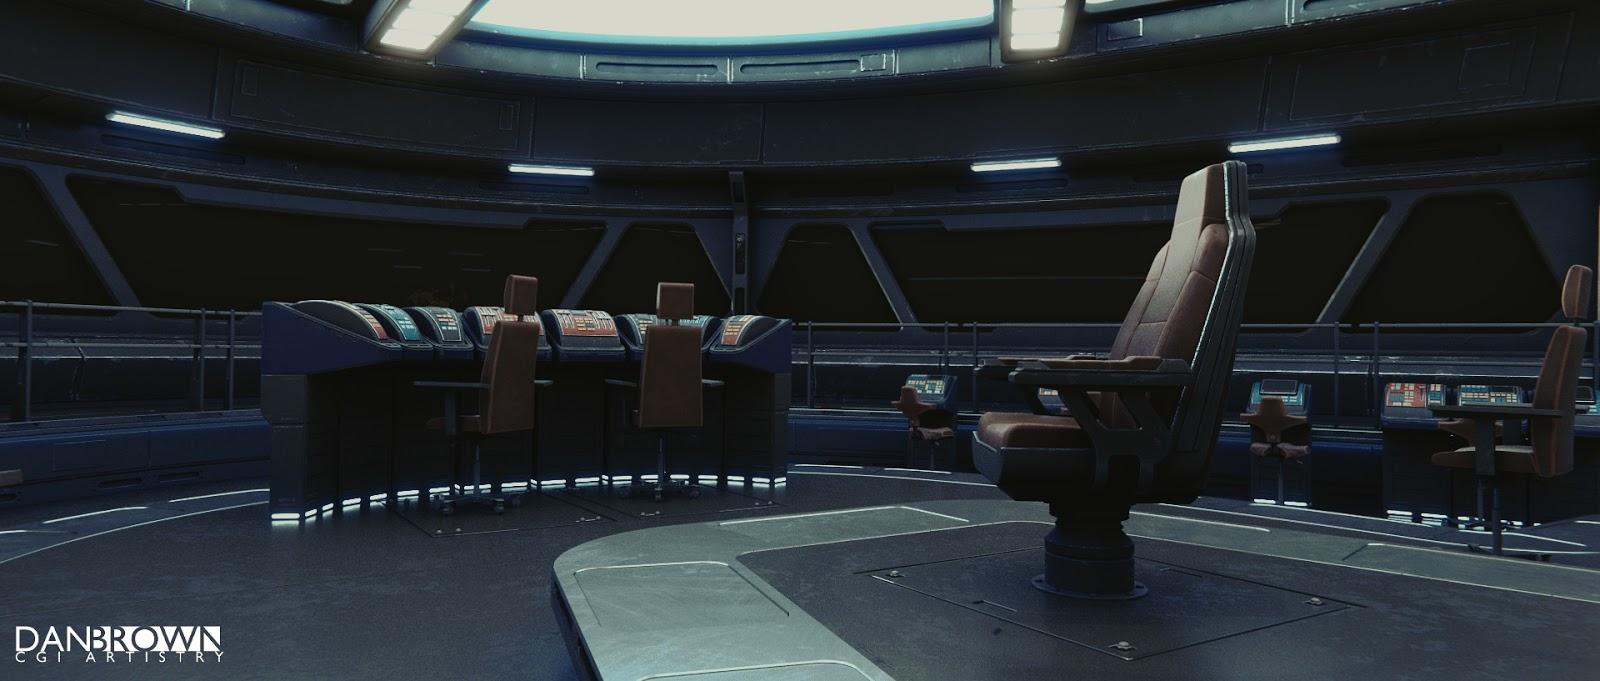 Dan brown cgi sci fi art adamant command center for 11553 sunshine terrace